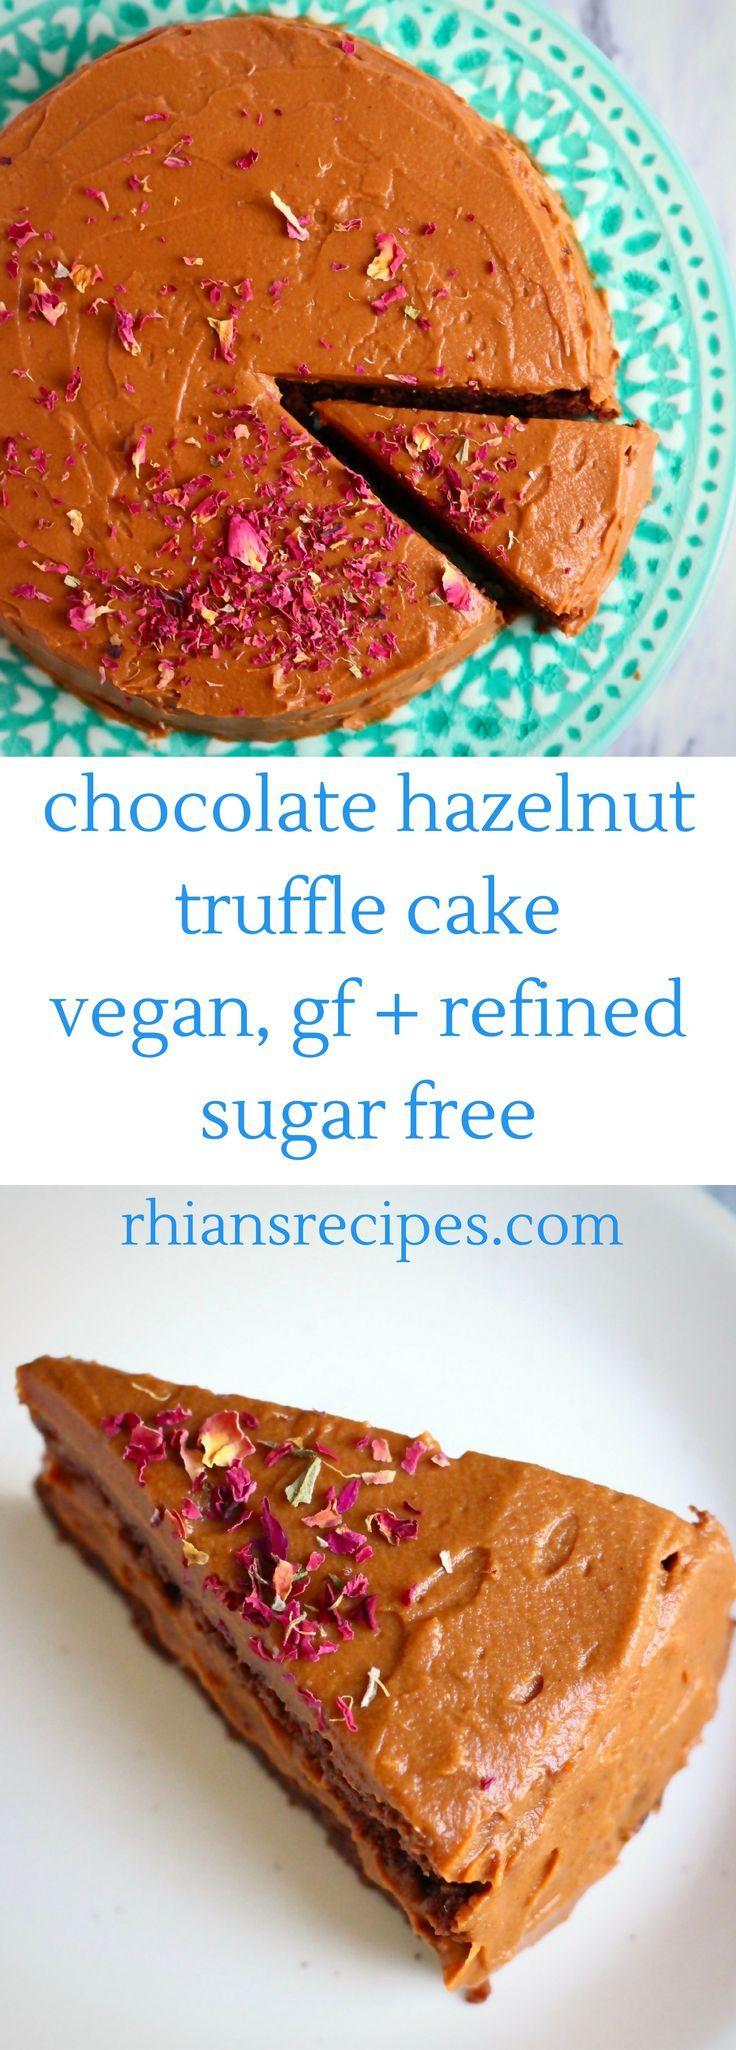 Chocolate Hazelnut Truffle Cake! Vegan, gluten-free + refined sugar free. Filled with the most delicious chocolate sweet potato buttercream.